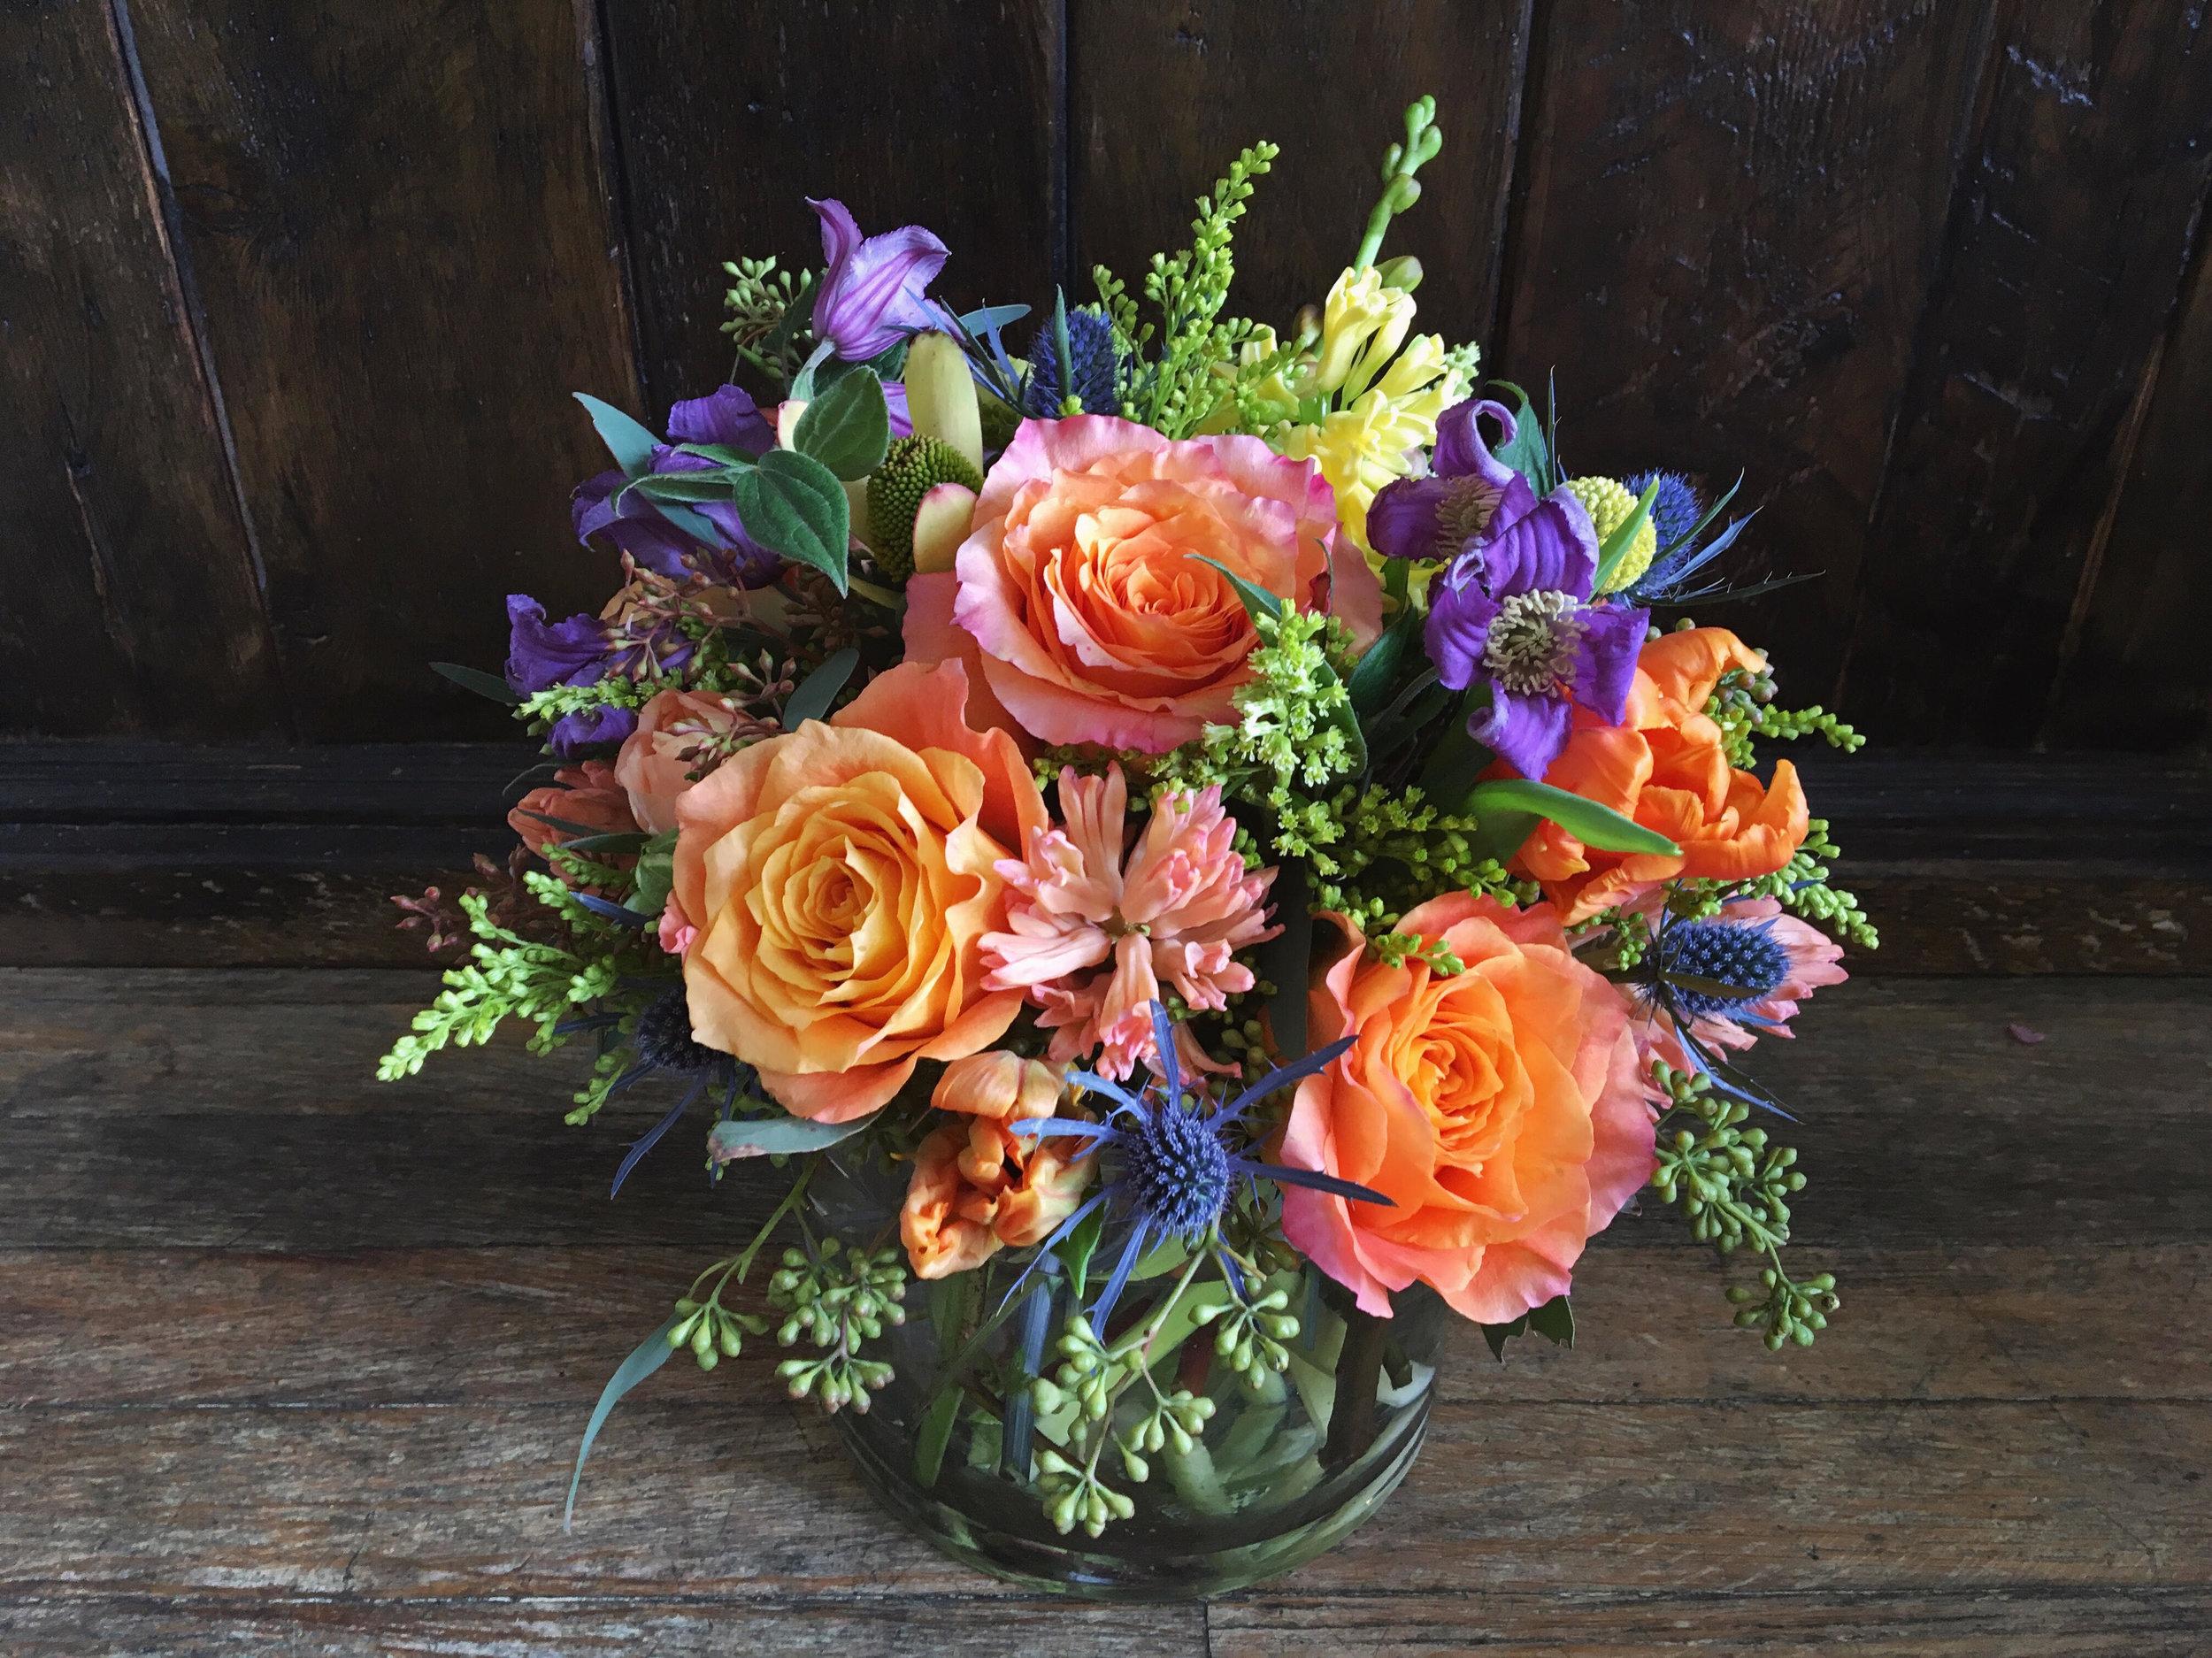 $100 arrangement in a glass vase